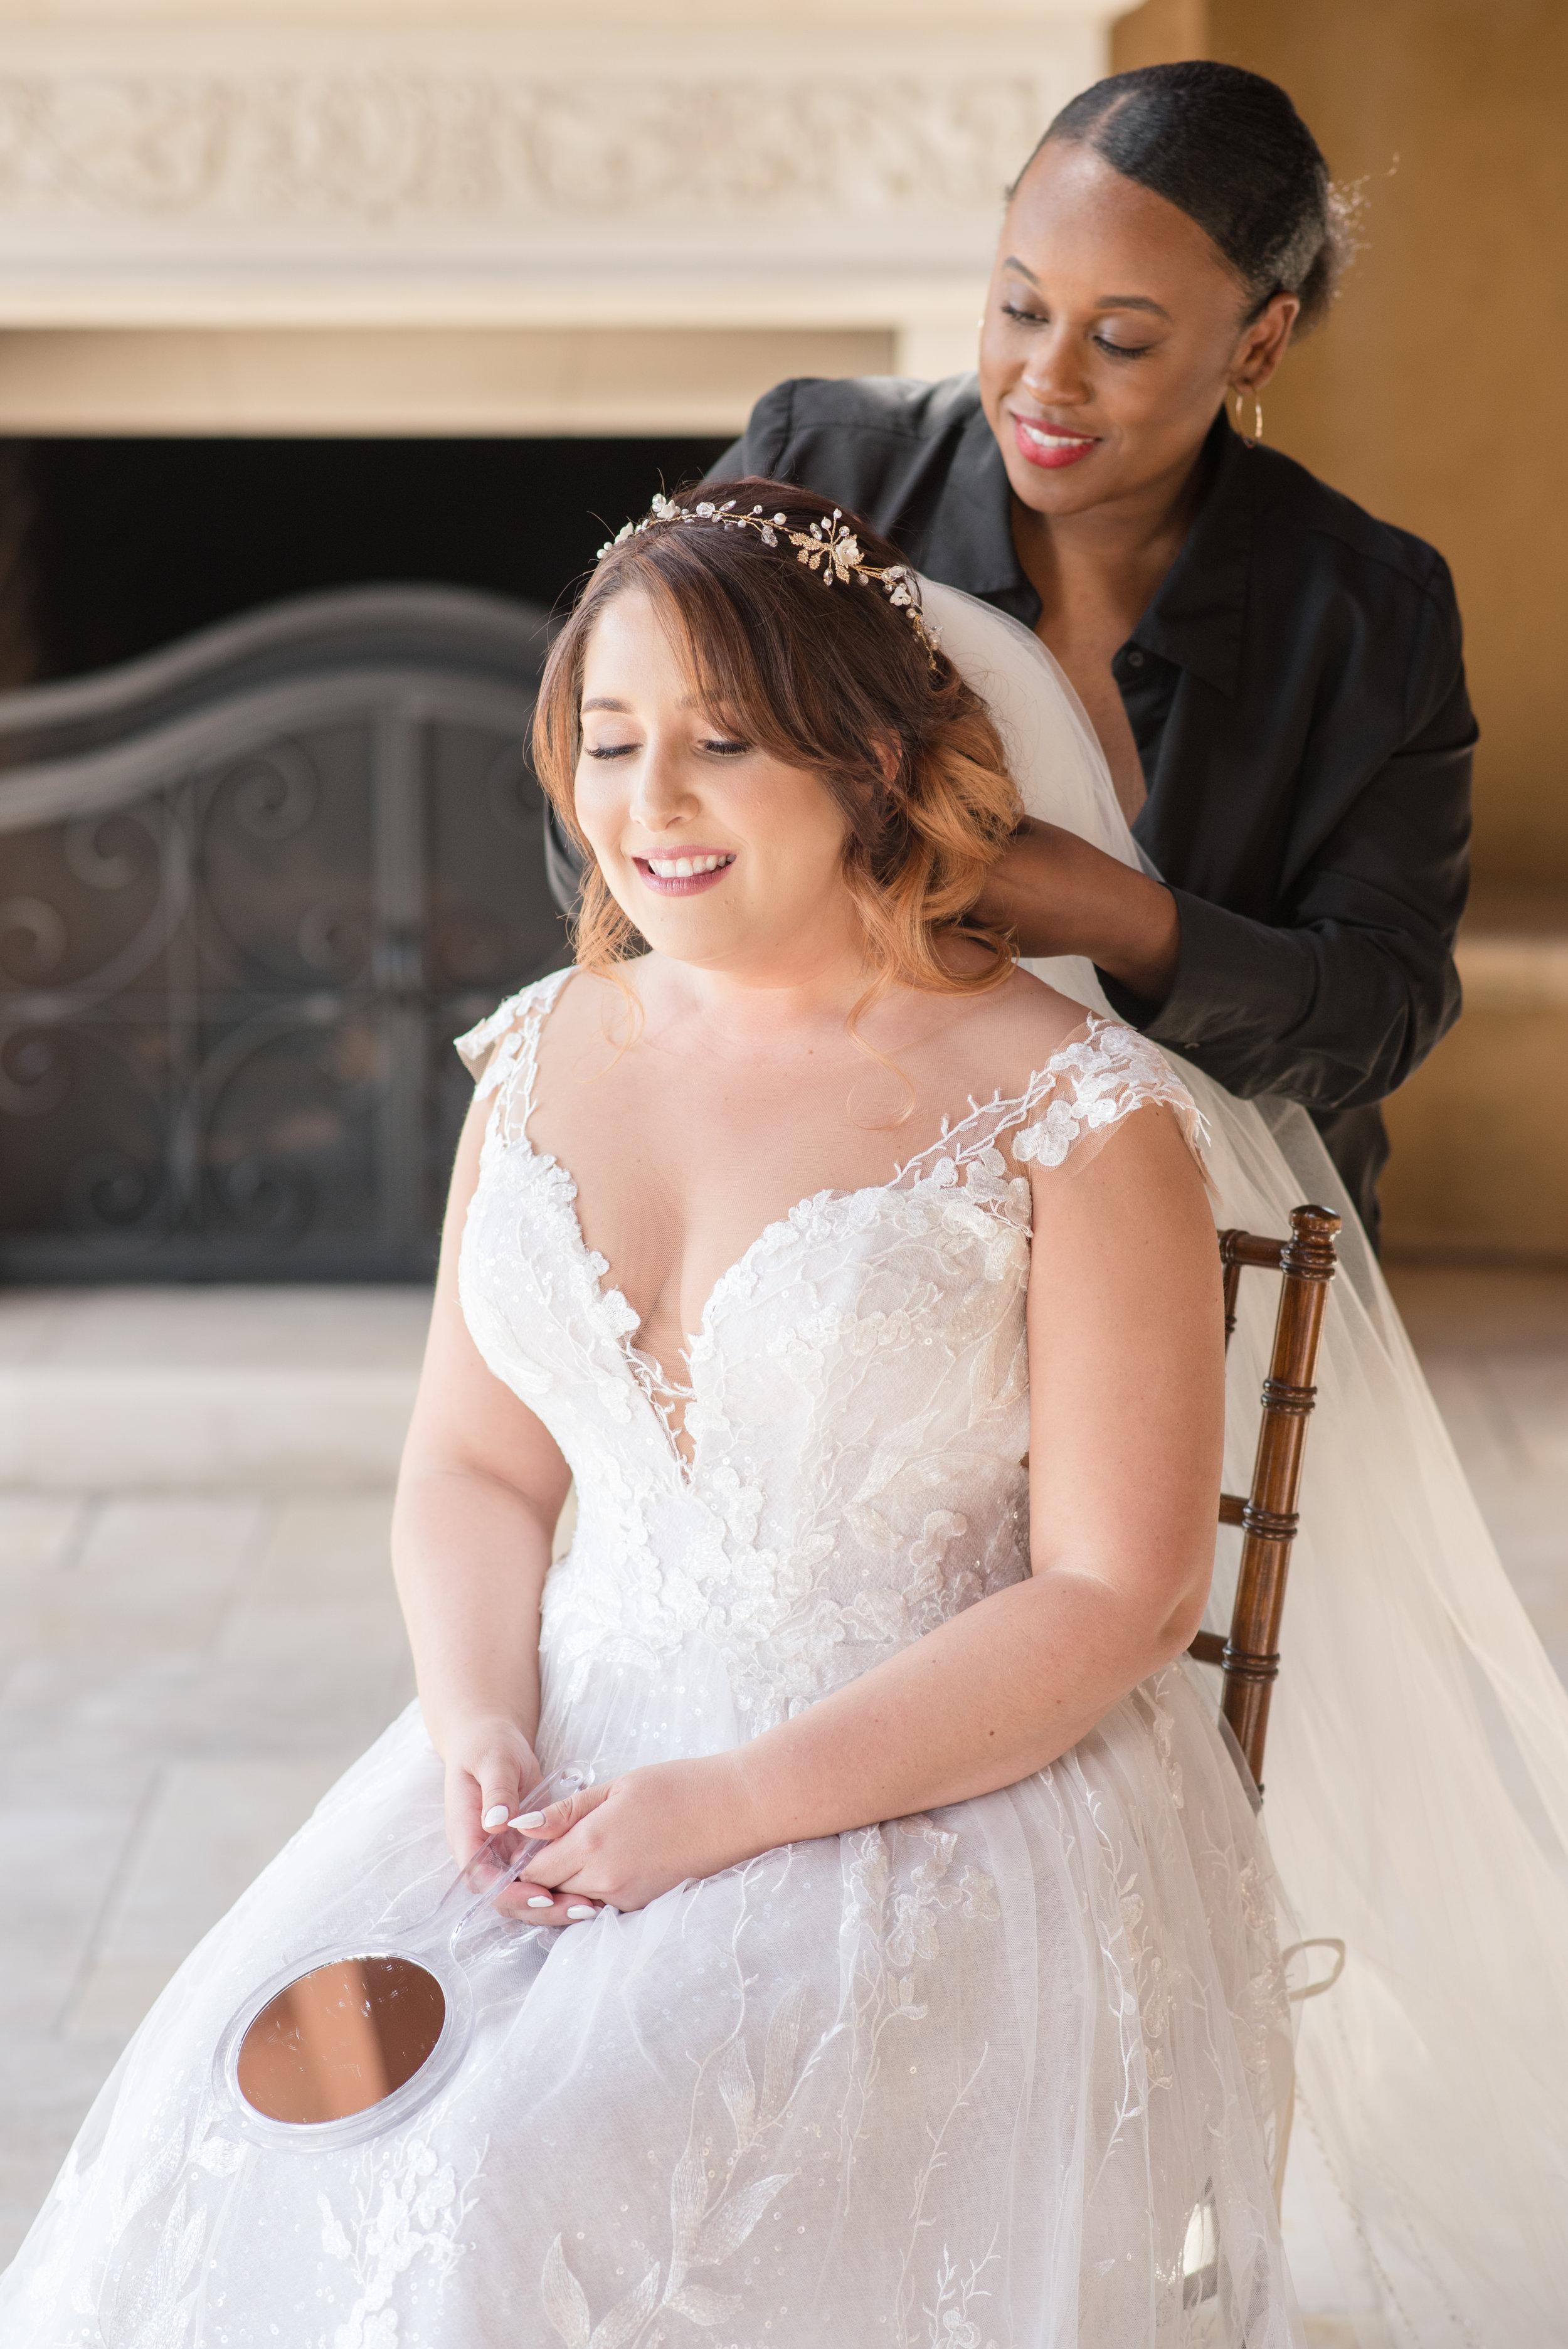 Behland Wedding - 66.jpg